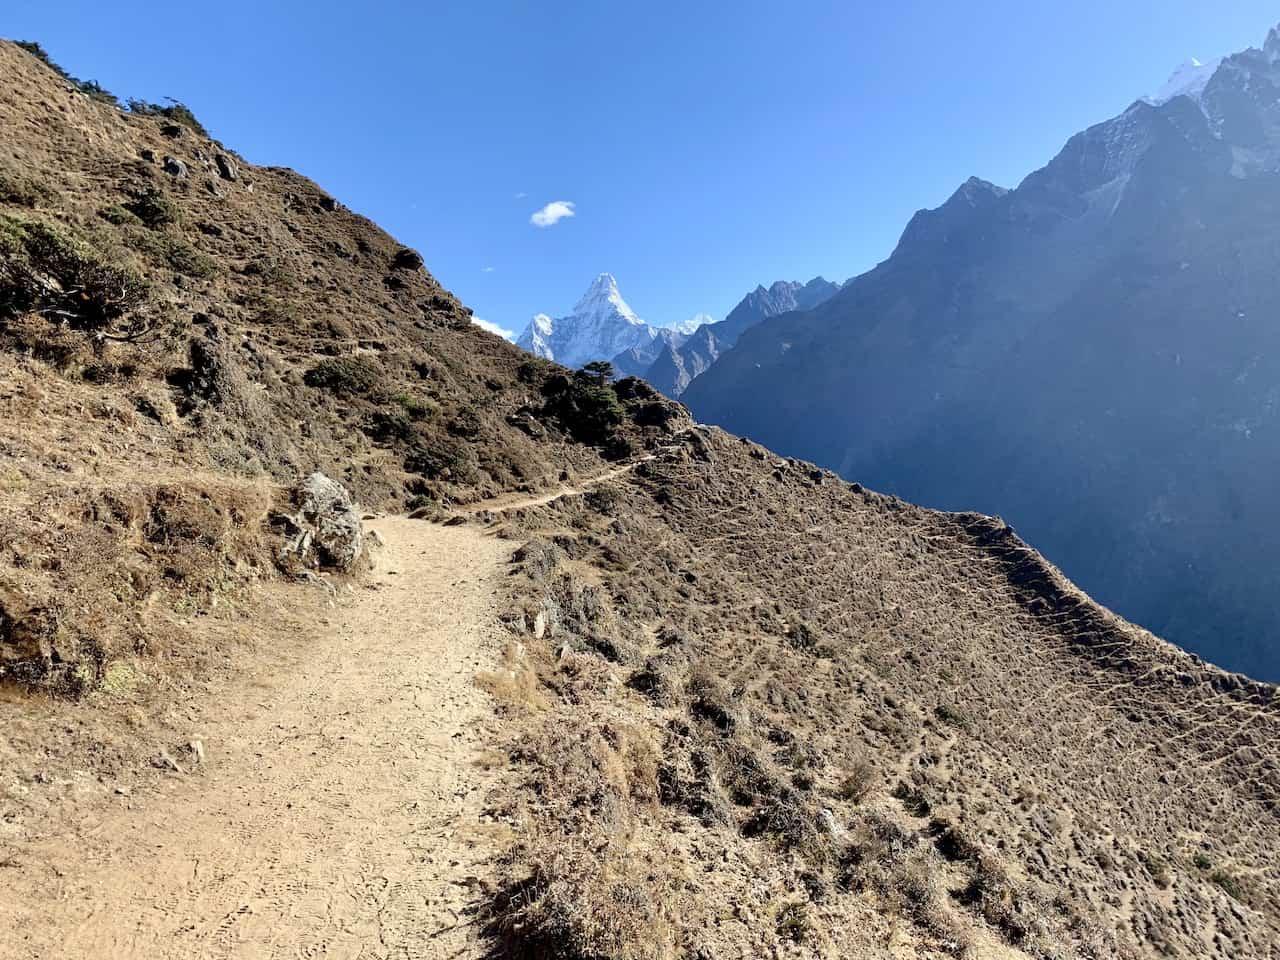 Ama Dablam Hotel Everest View